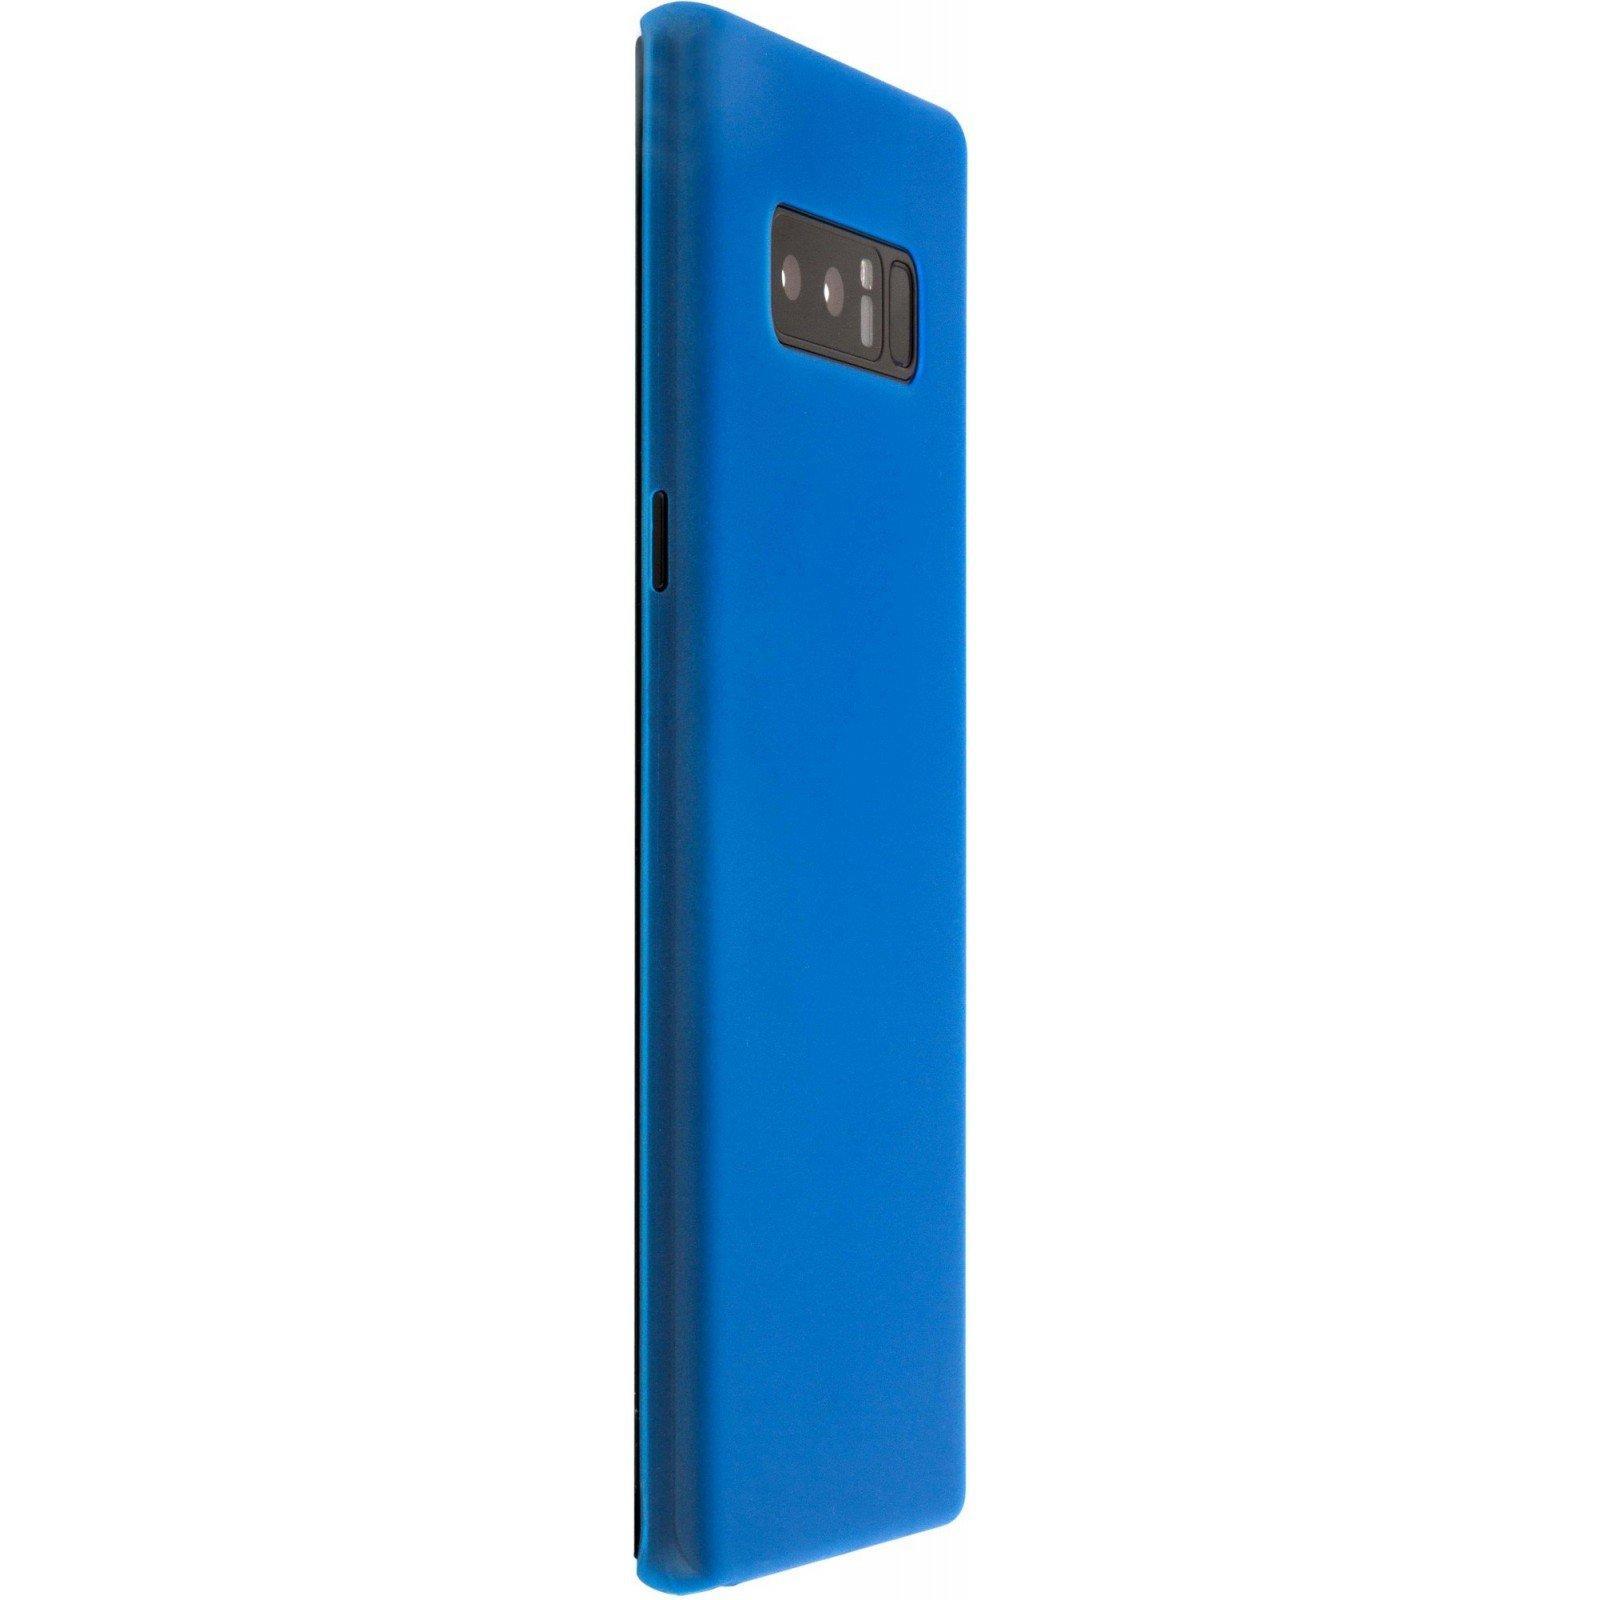 Чехол для моб. телефона MakeFuture PP/Ice Case для Samsung Note 8 Blue (MCI-SN8BL) изображение 2